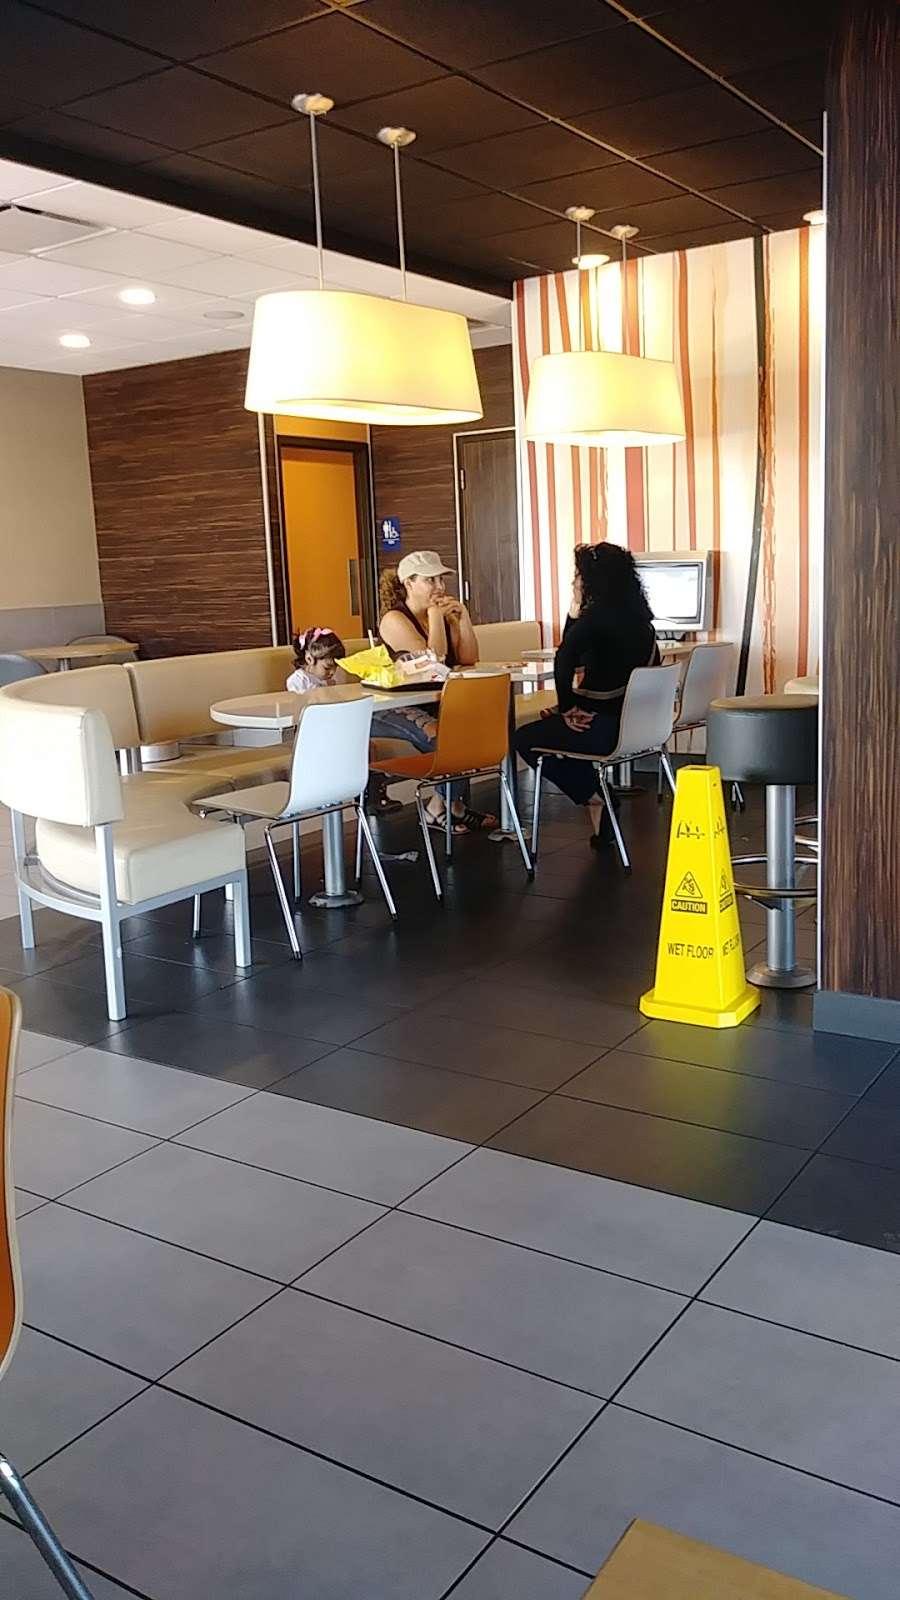 McDonalds - cafe    Photo 3 of 10   Address: 2012 Scyene Rd, Mesquite, TX 75149, USA   Phone: (972) 289-2950